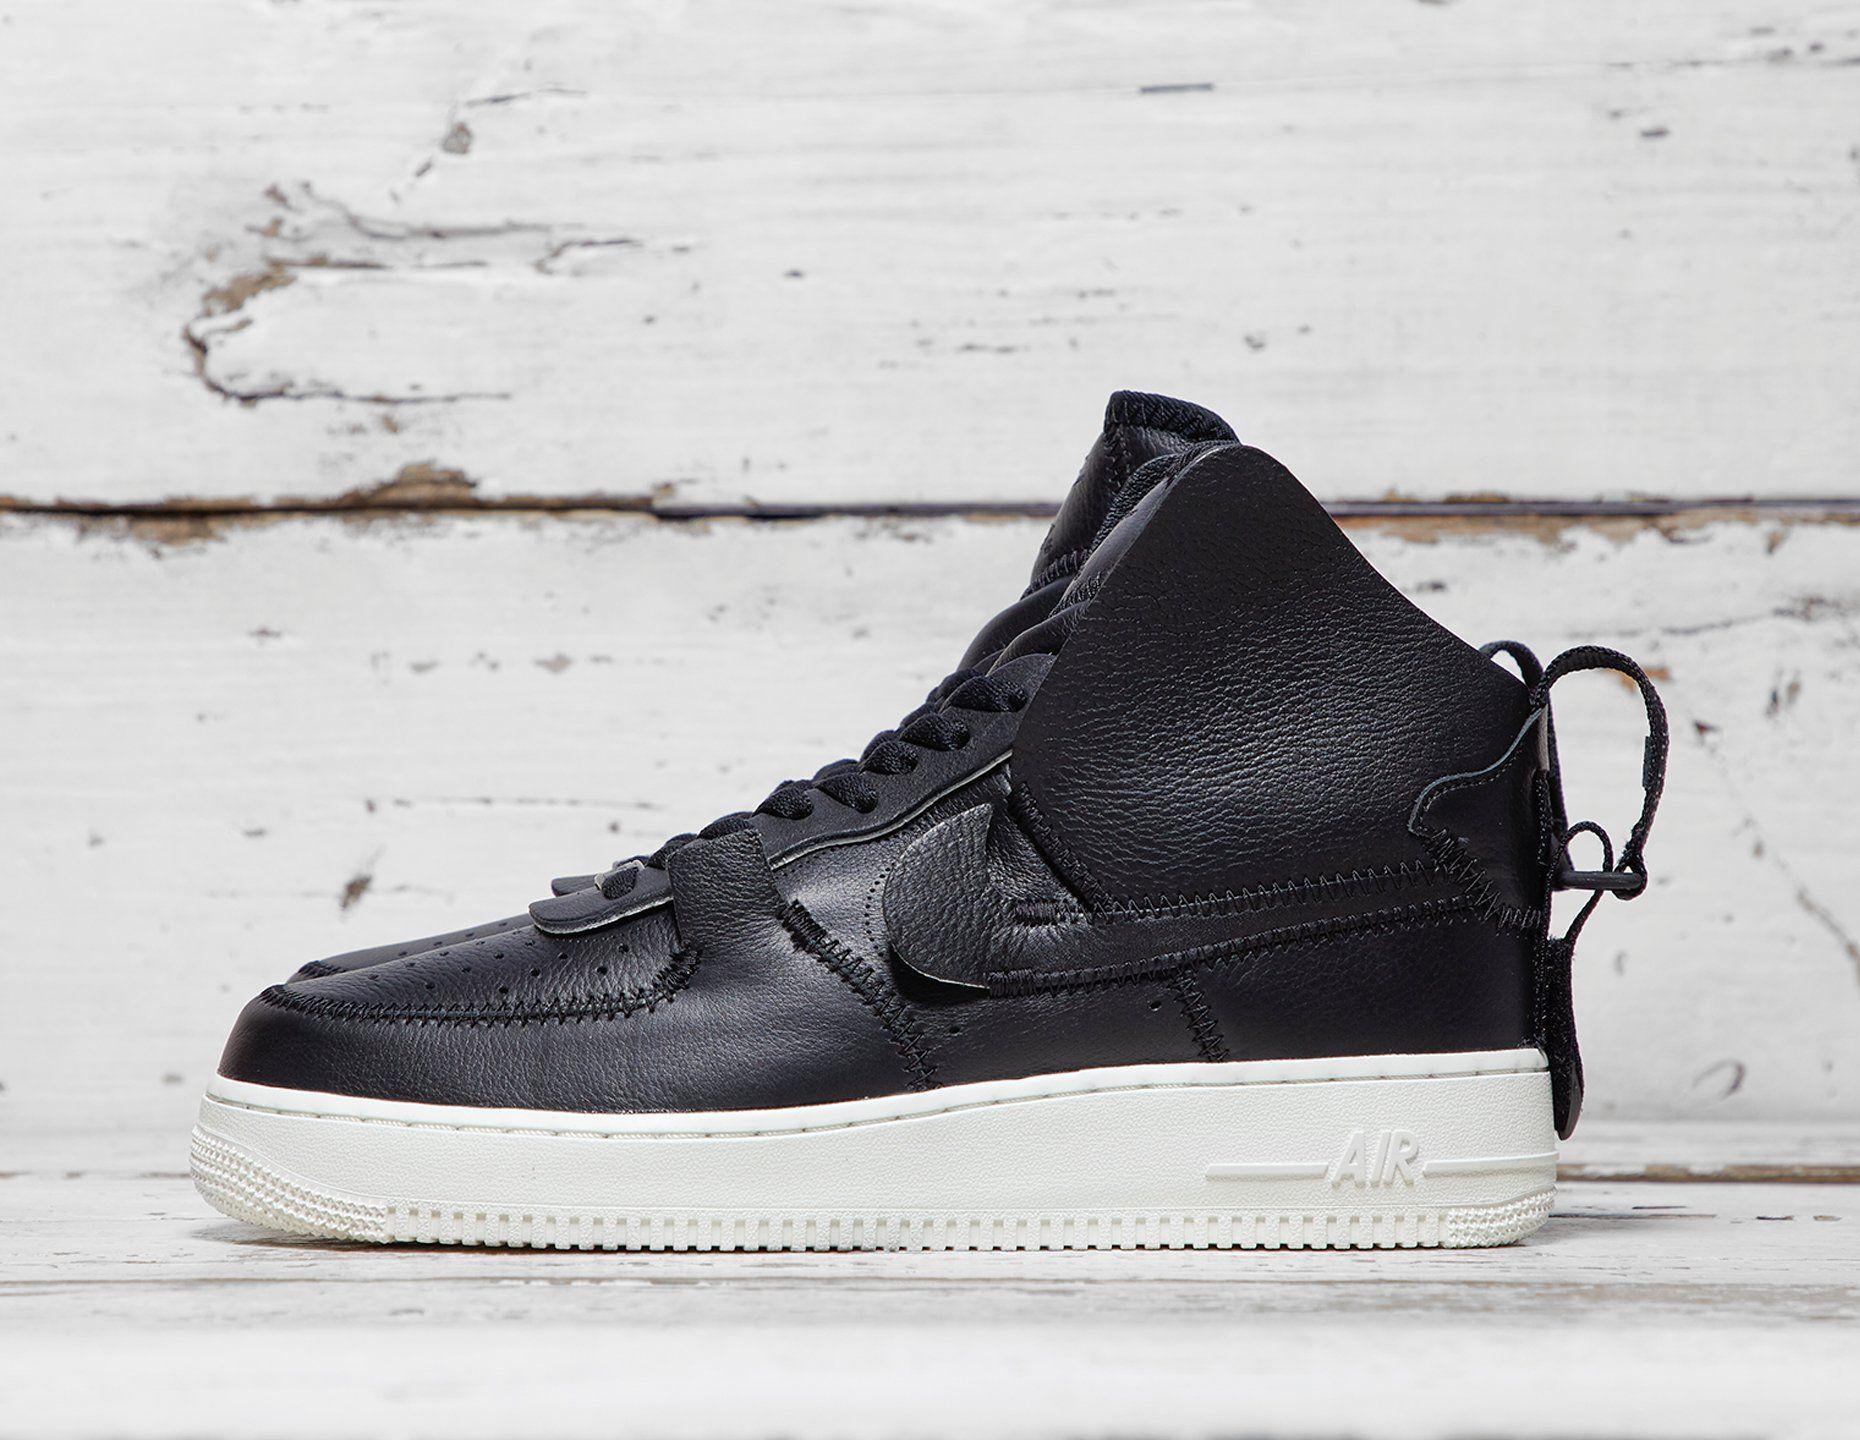 47760ade7b02db Nike x PSNY Air Force 1 High